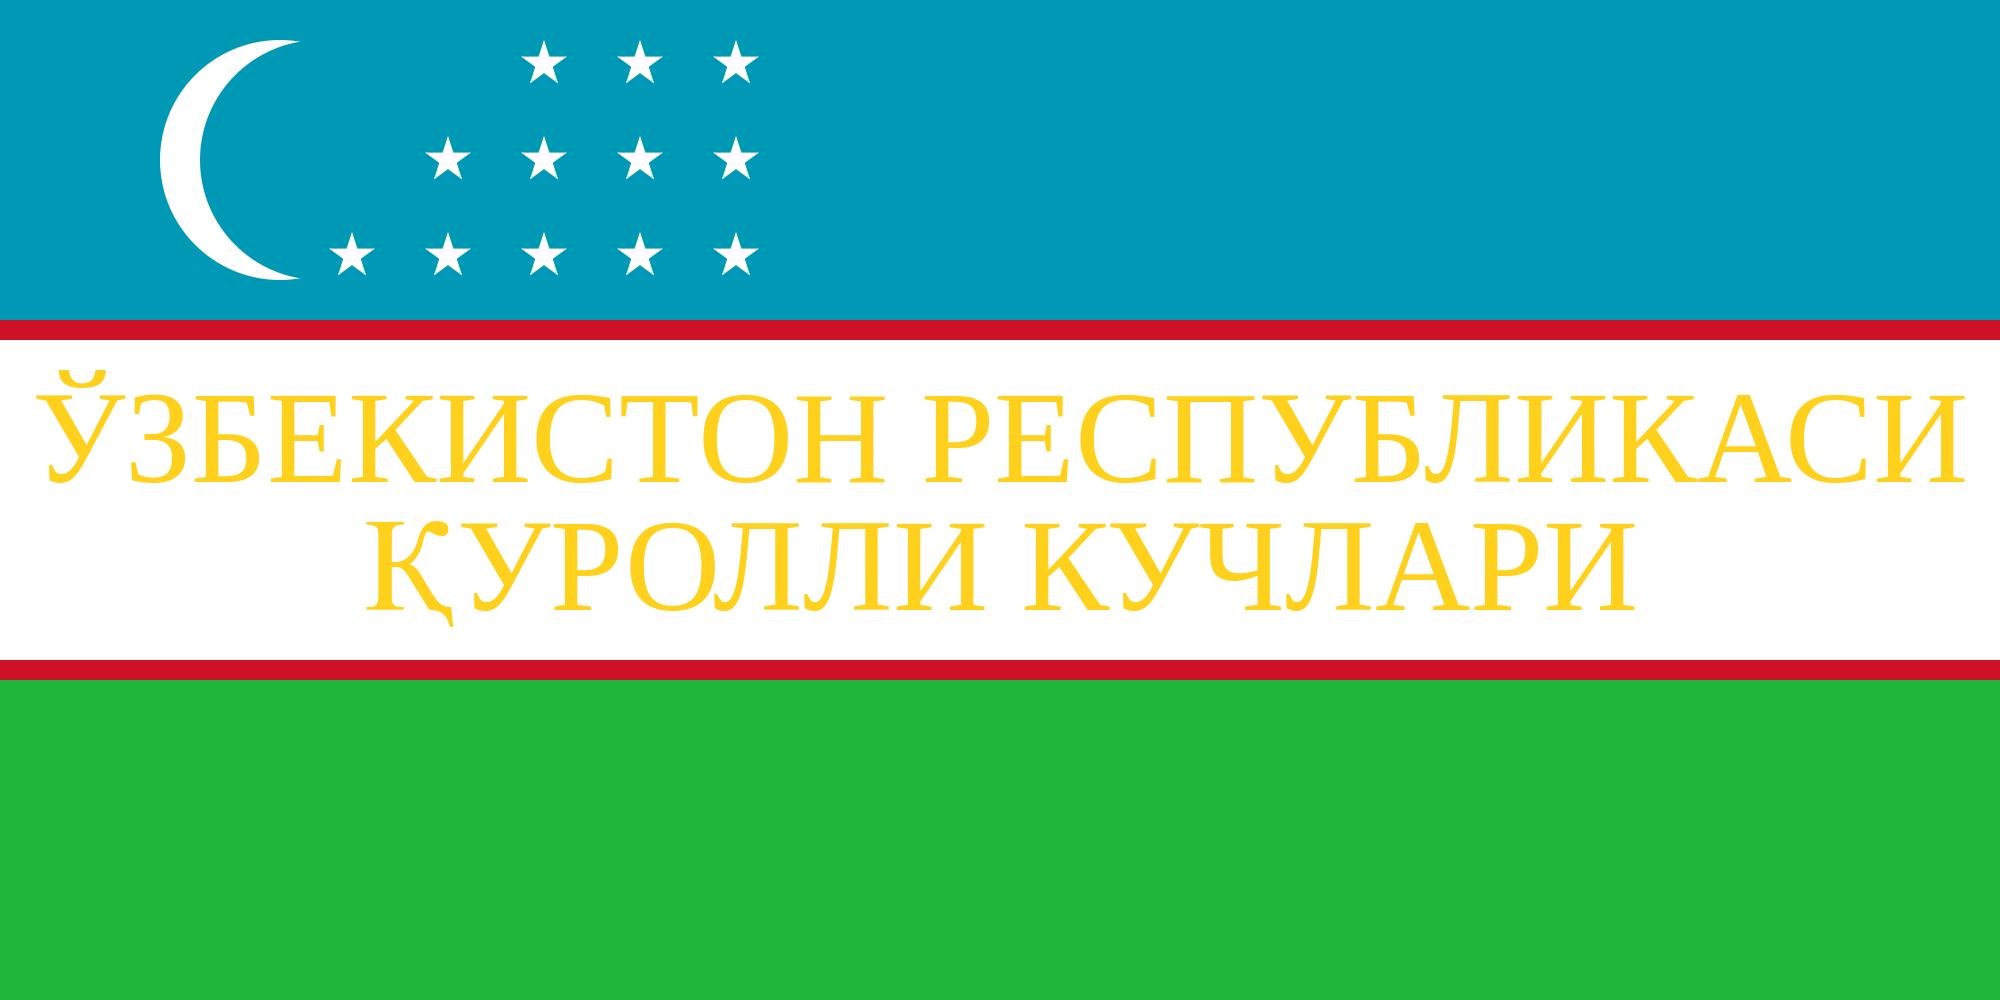 Uzbekistan (War flag)